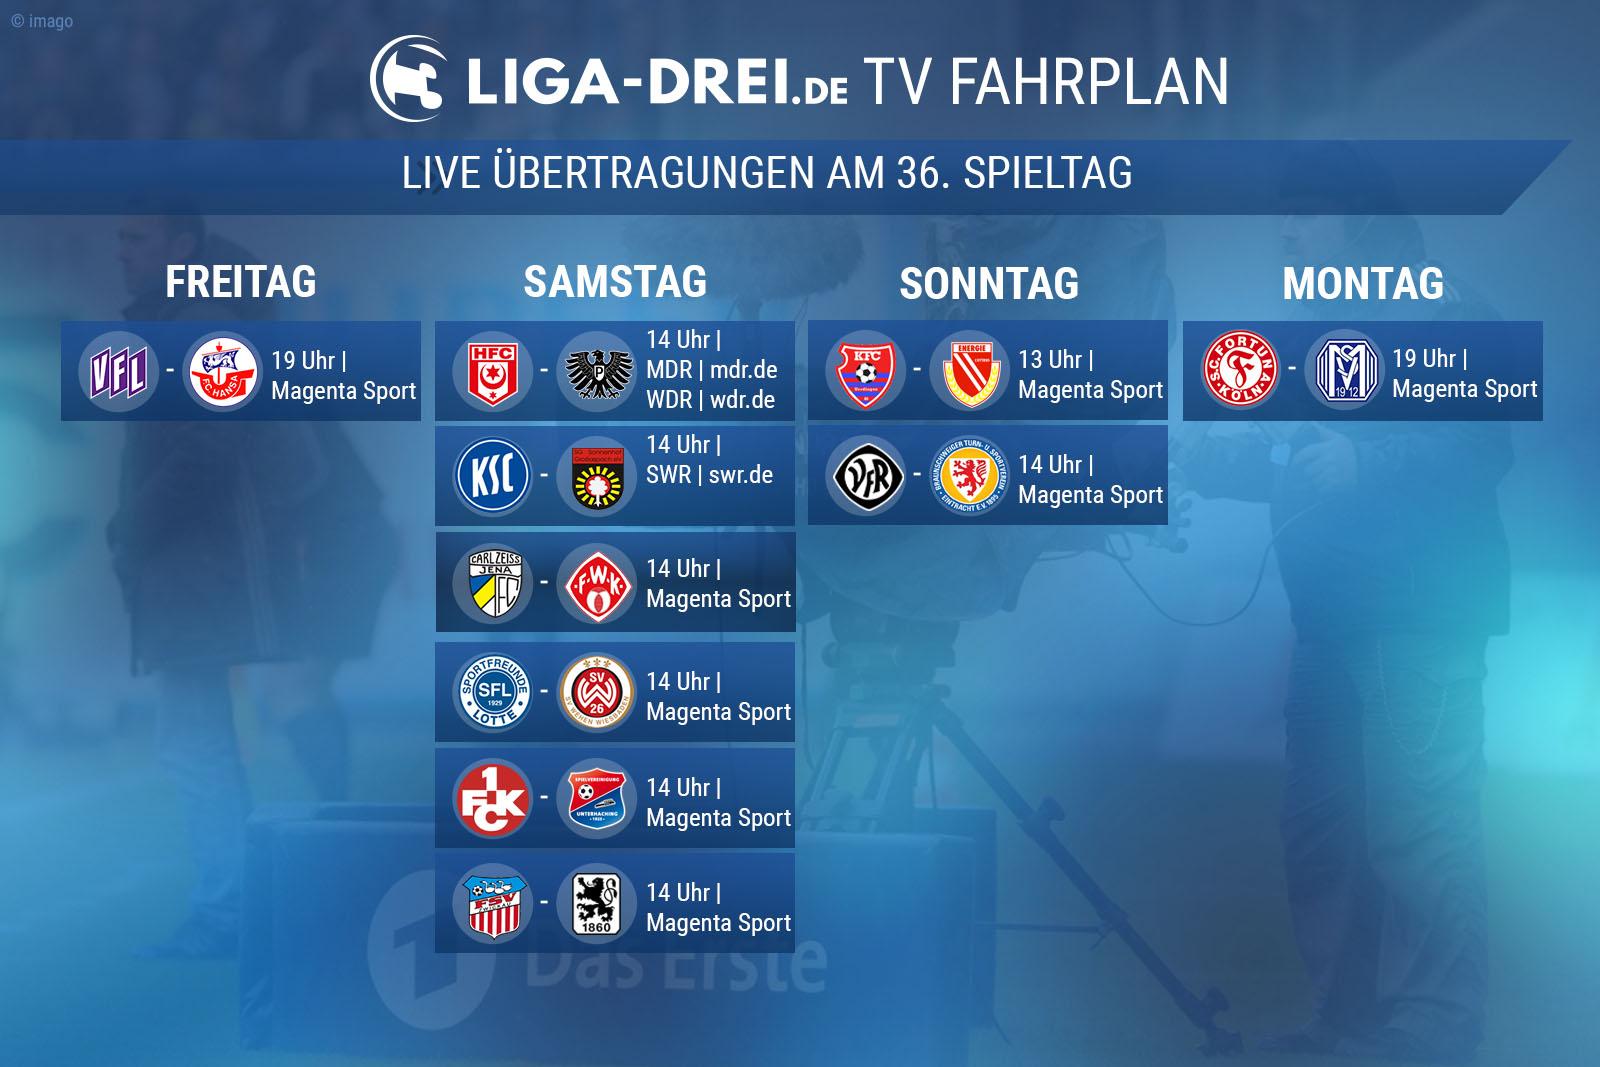 tv-fahrplan-dritte liga- free-tv